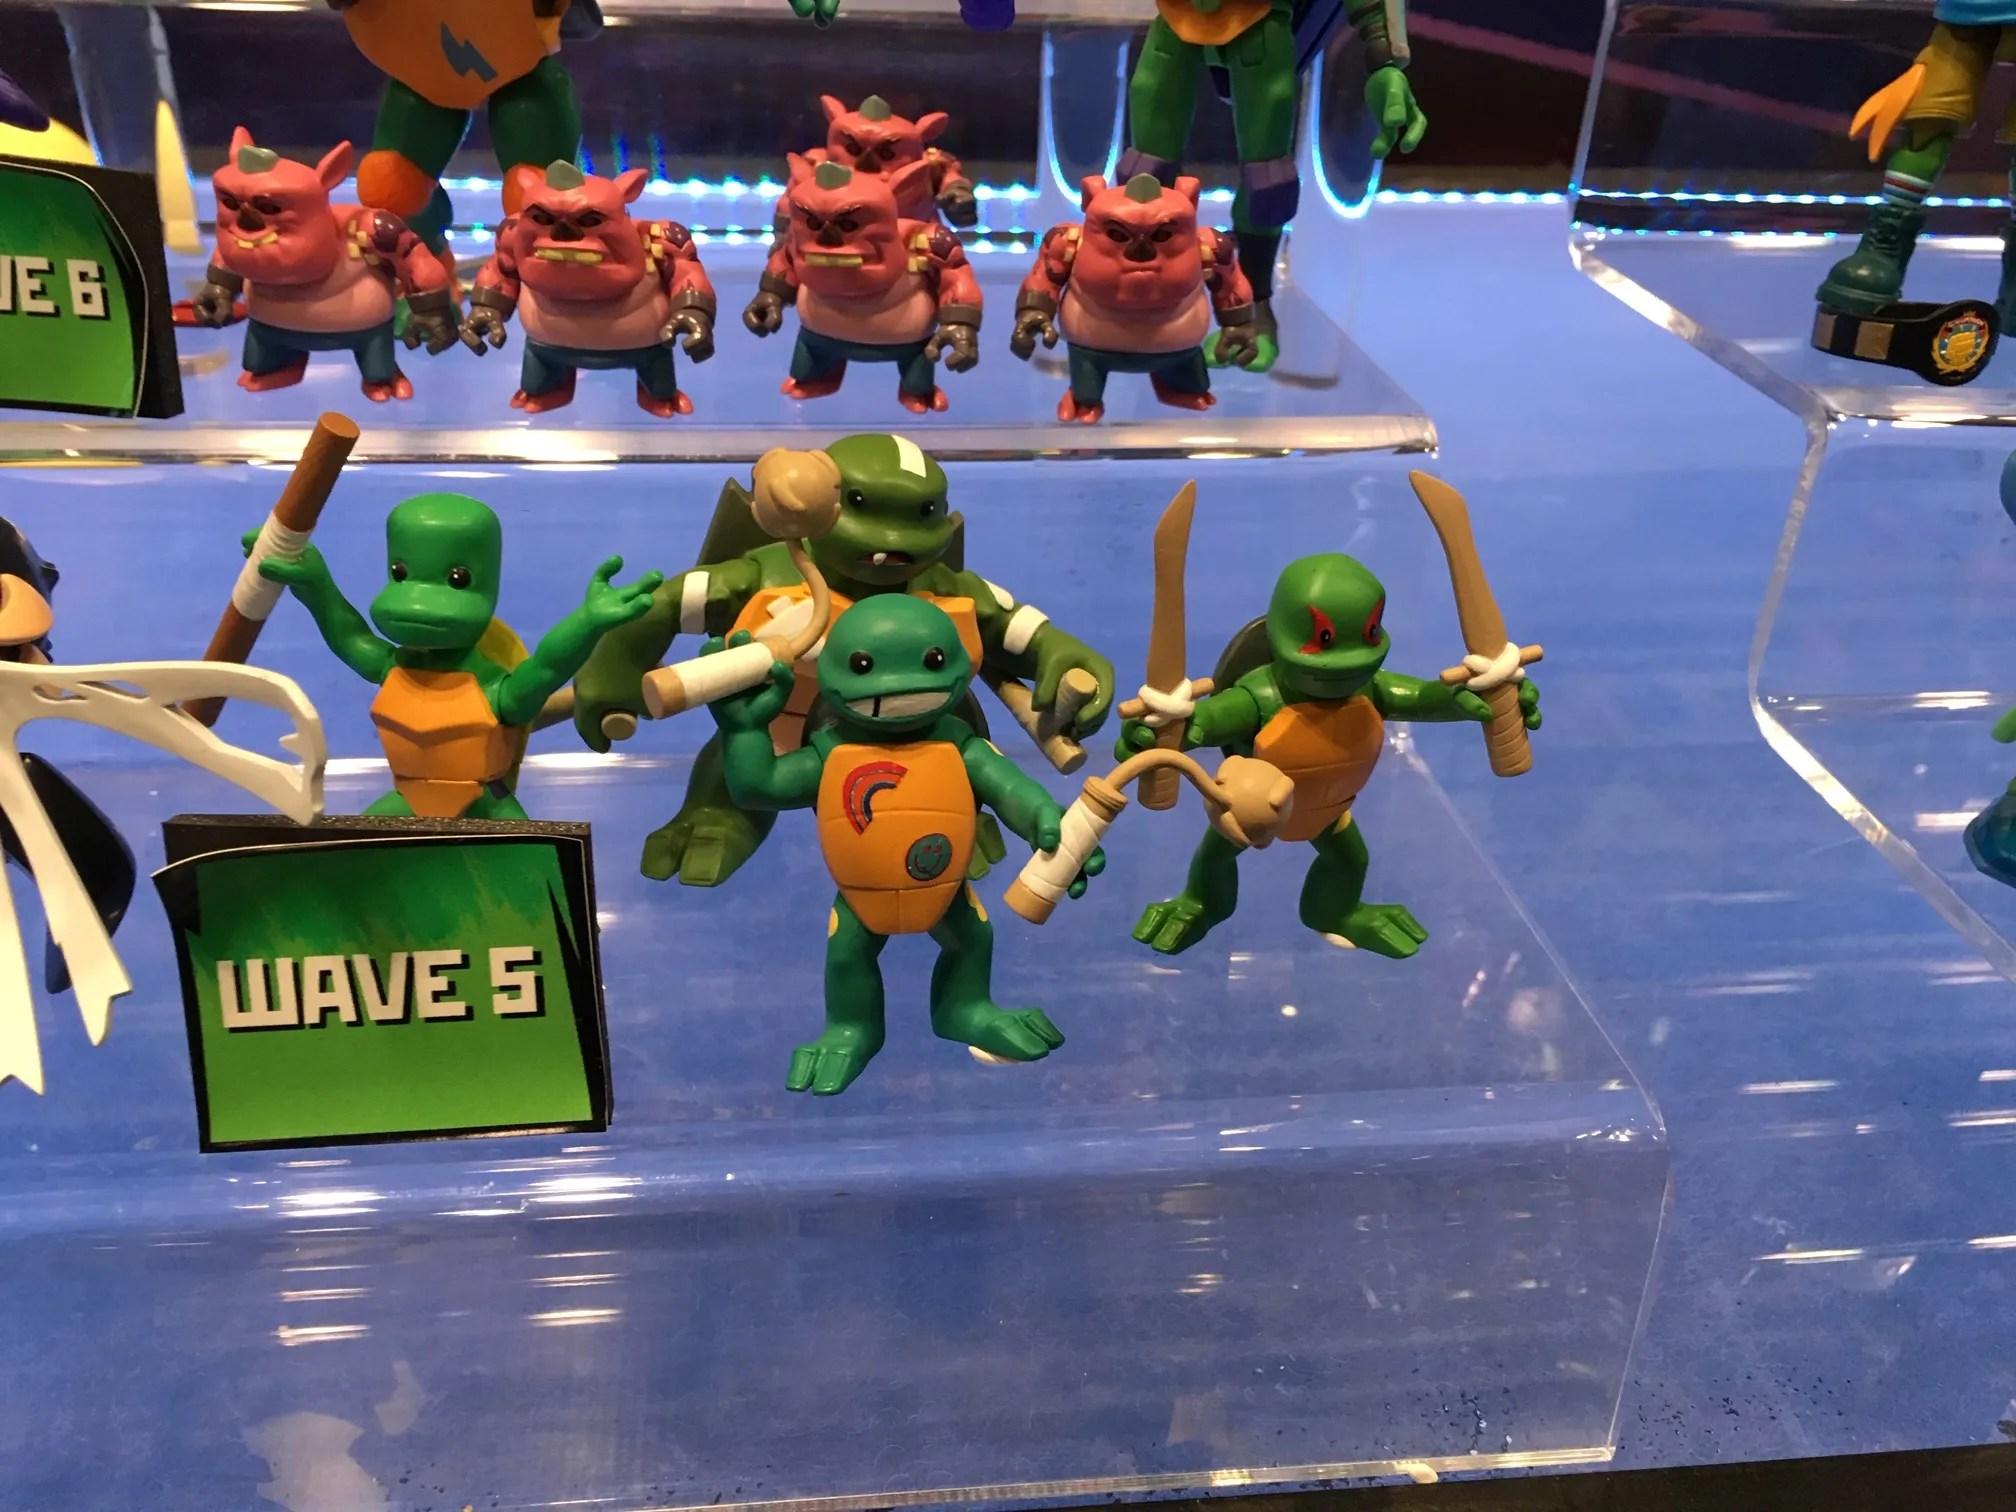 Rise of the Teenage Mutant Ninja Turtles Michelangelo TMNT Action Figure New